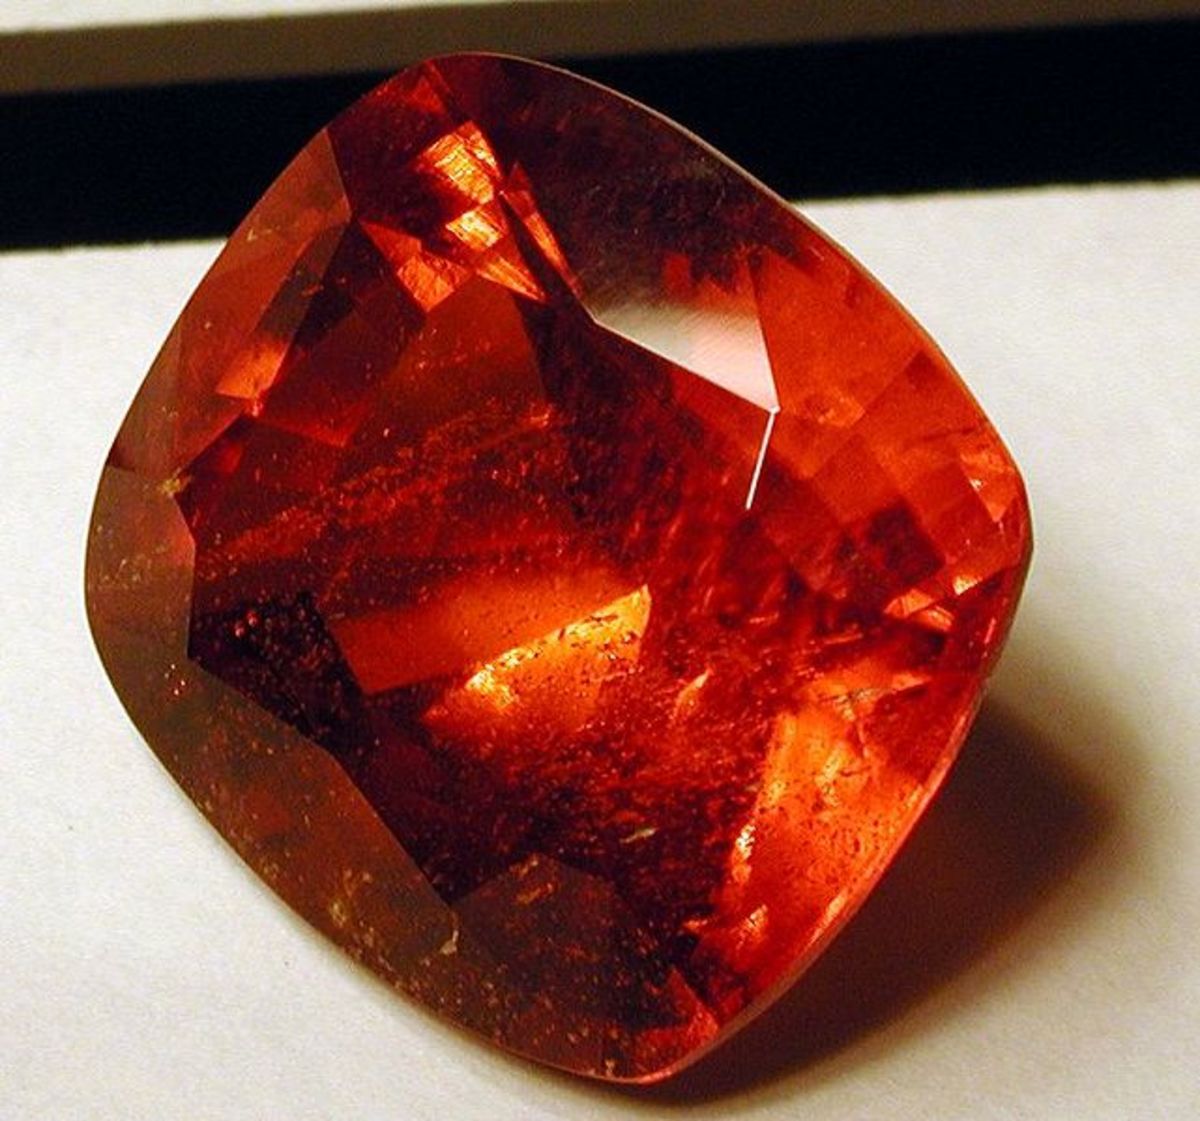 A gorgeous red gemstone.